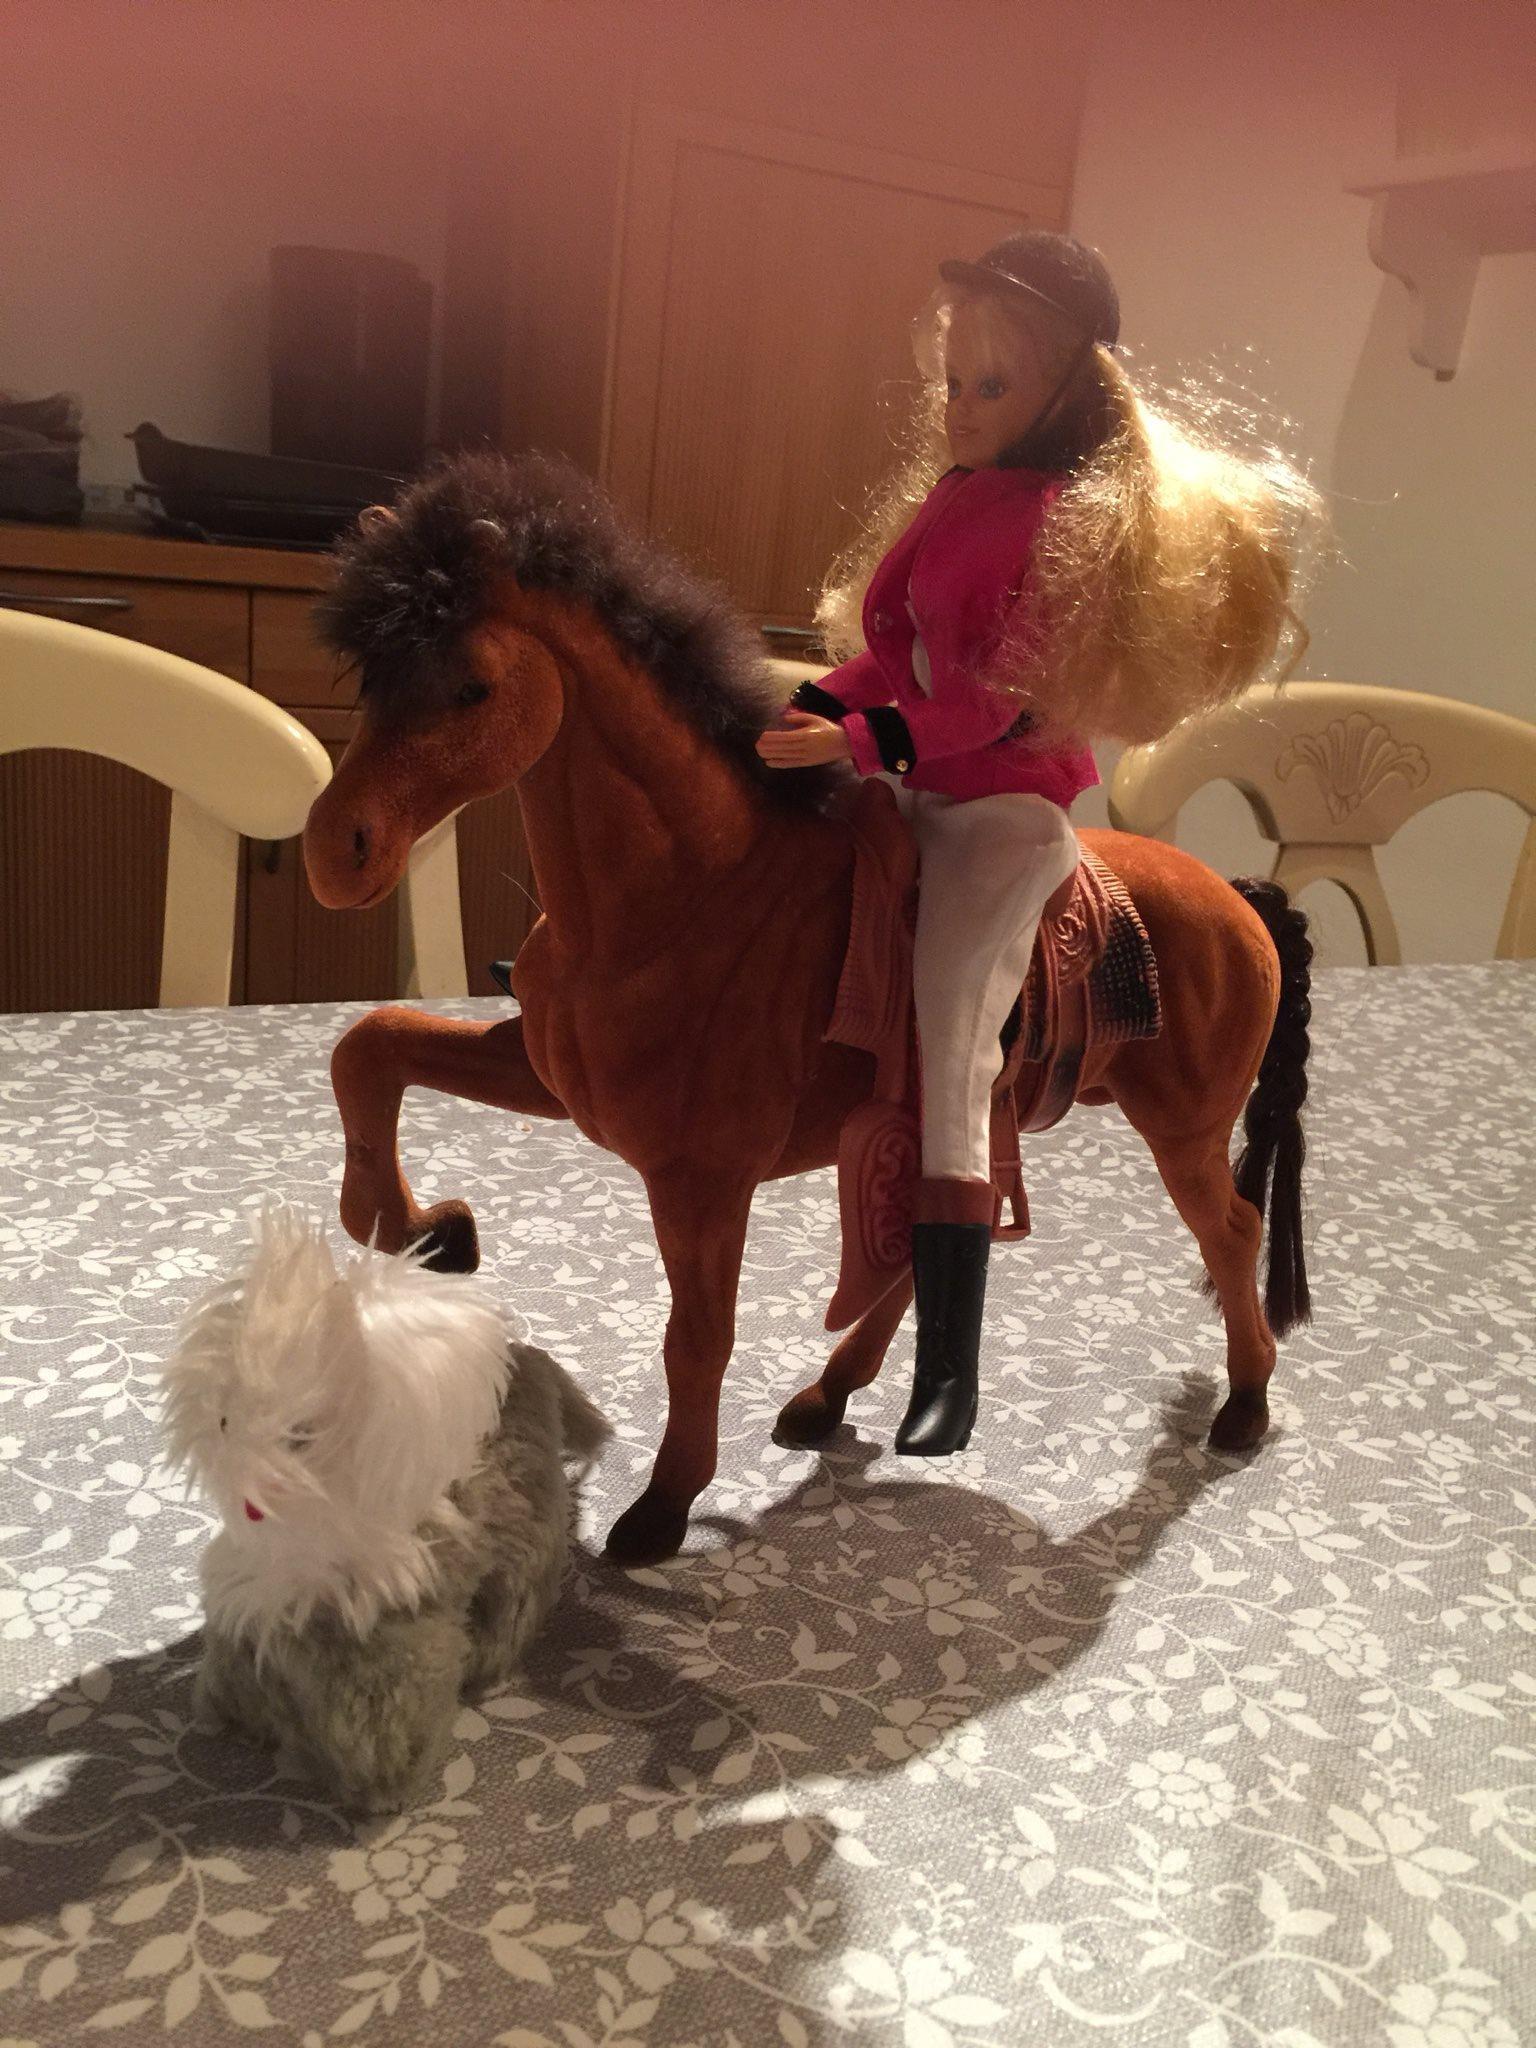 Gående häst leksak